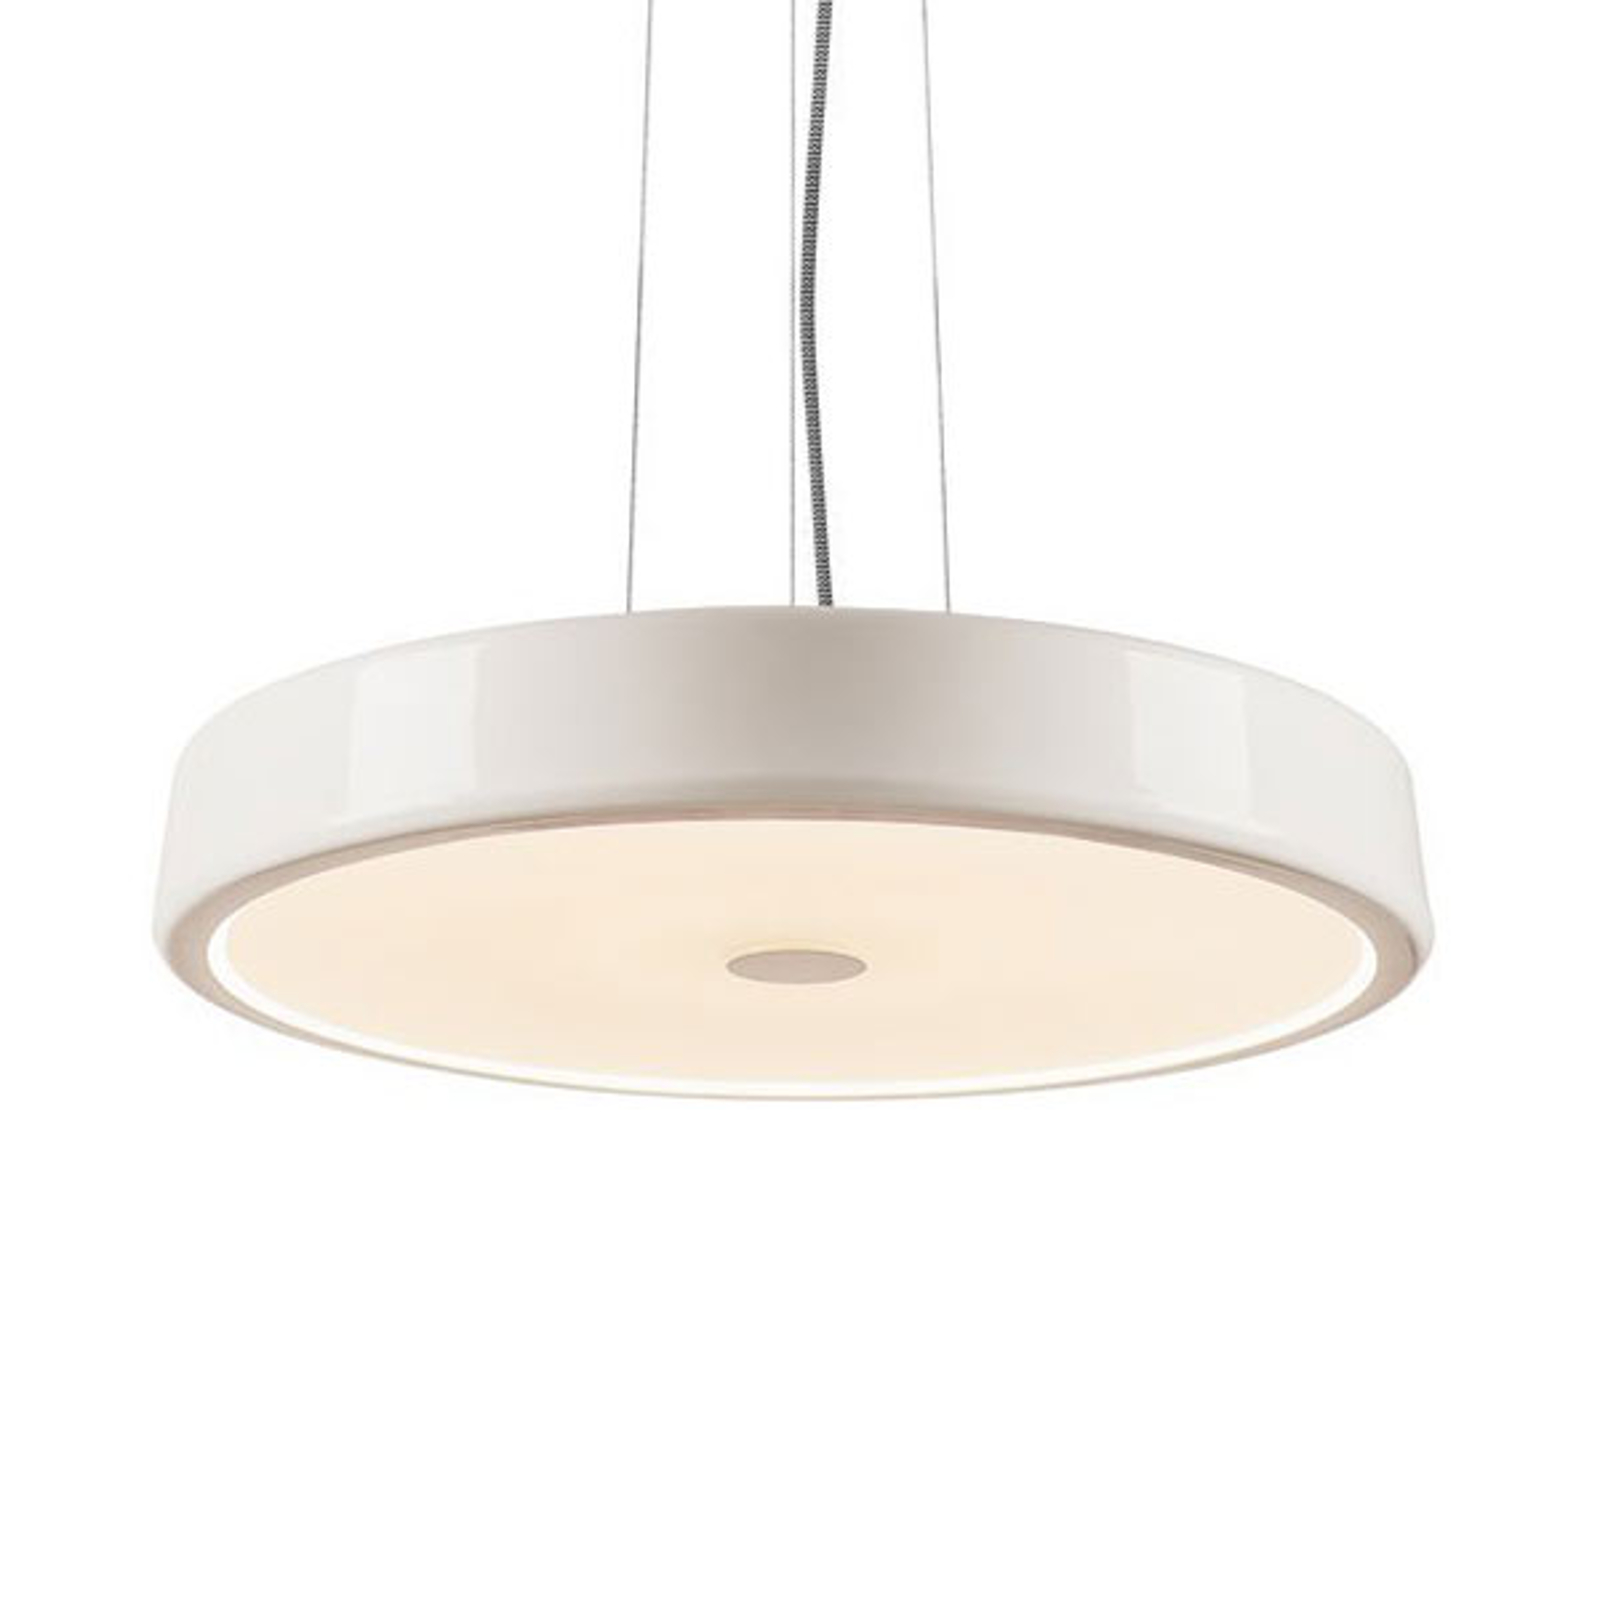 SLV Sphera LED-Hängeleuchte, dimmbar, Ø 45 cm